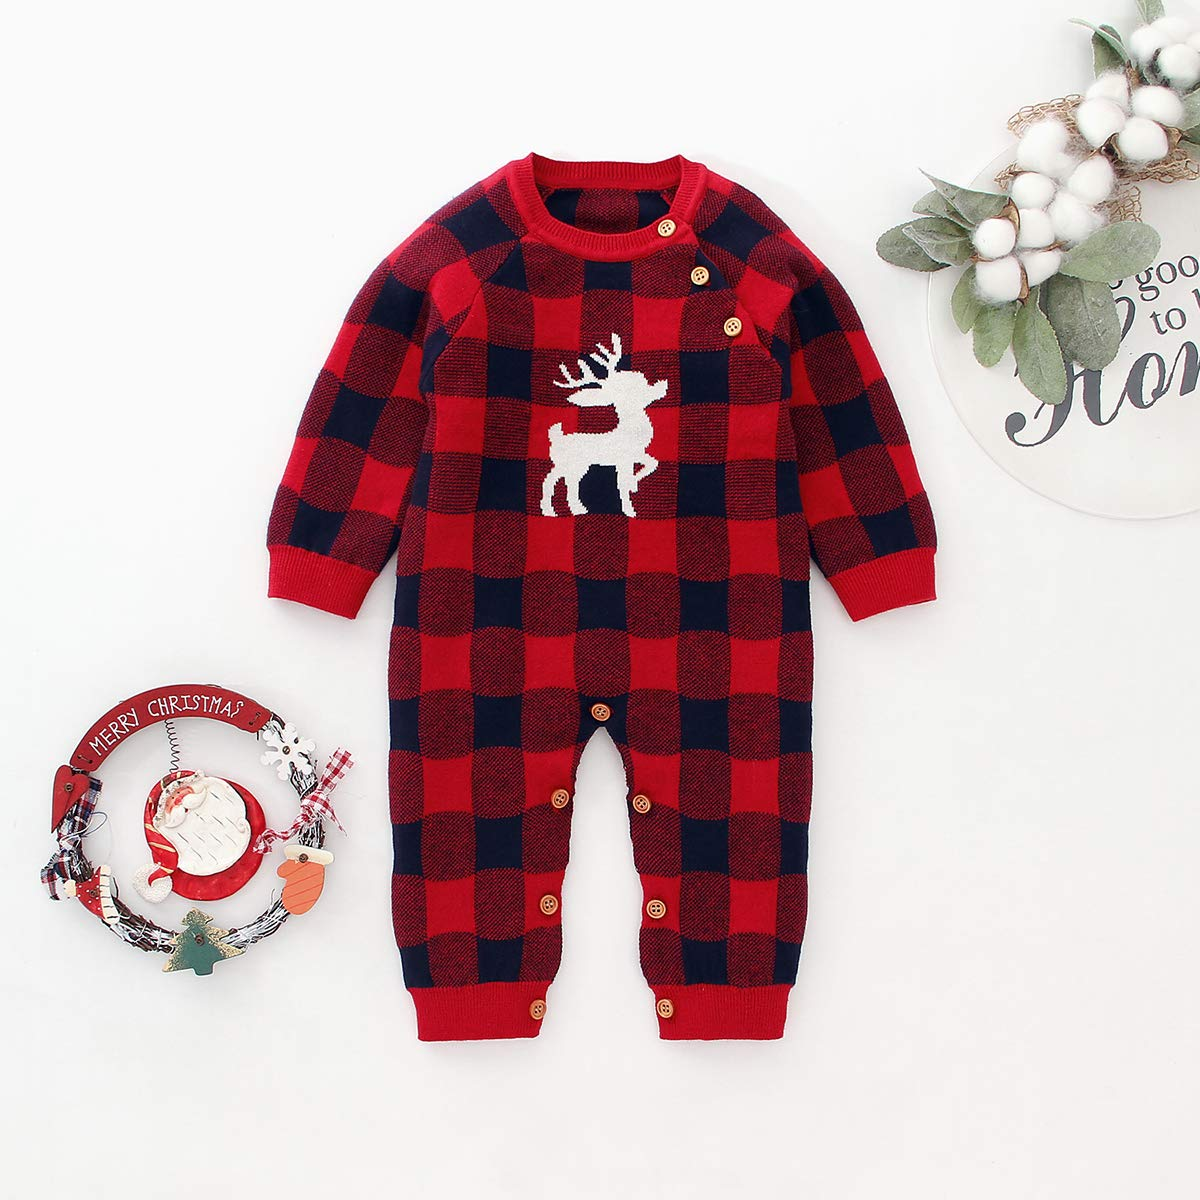 Tianhaik Infant Baby Boy Girl Xmas Plaid Romper Long Sleeve Jumpsuit Elk Pattern Bodysuit